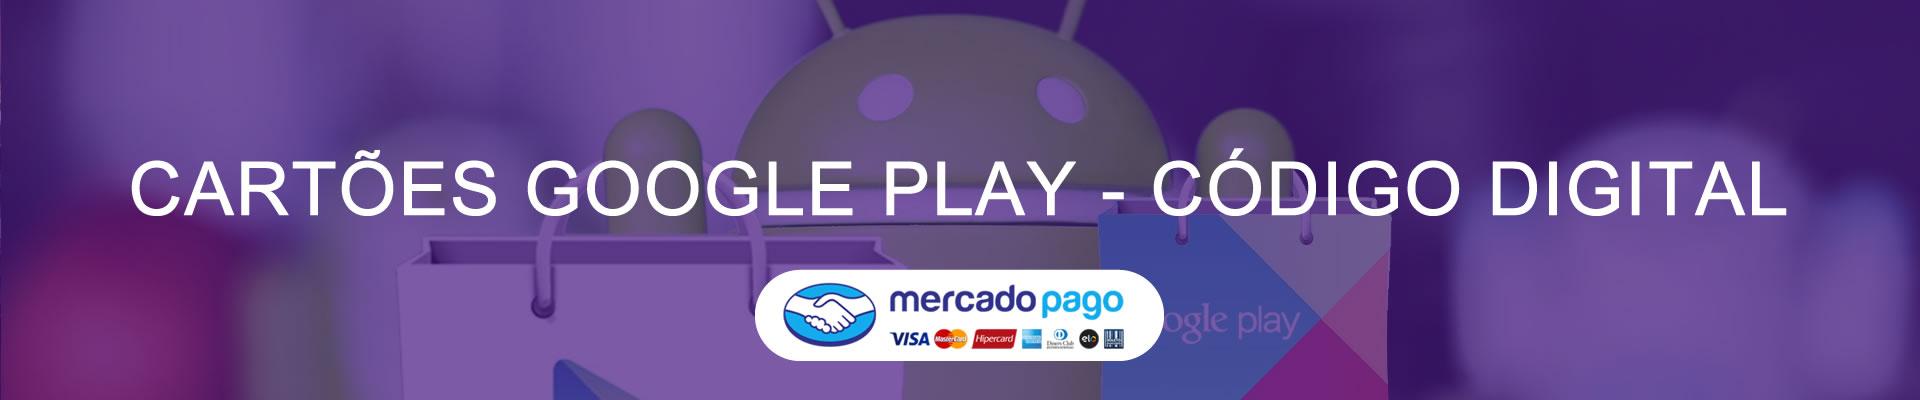 cartao-google-play-digital